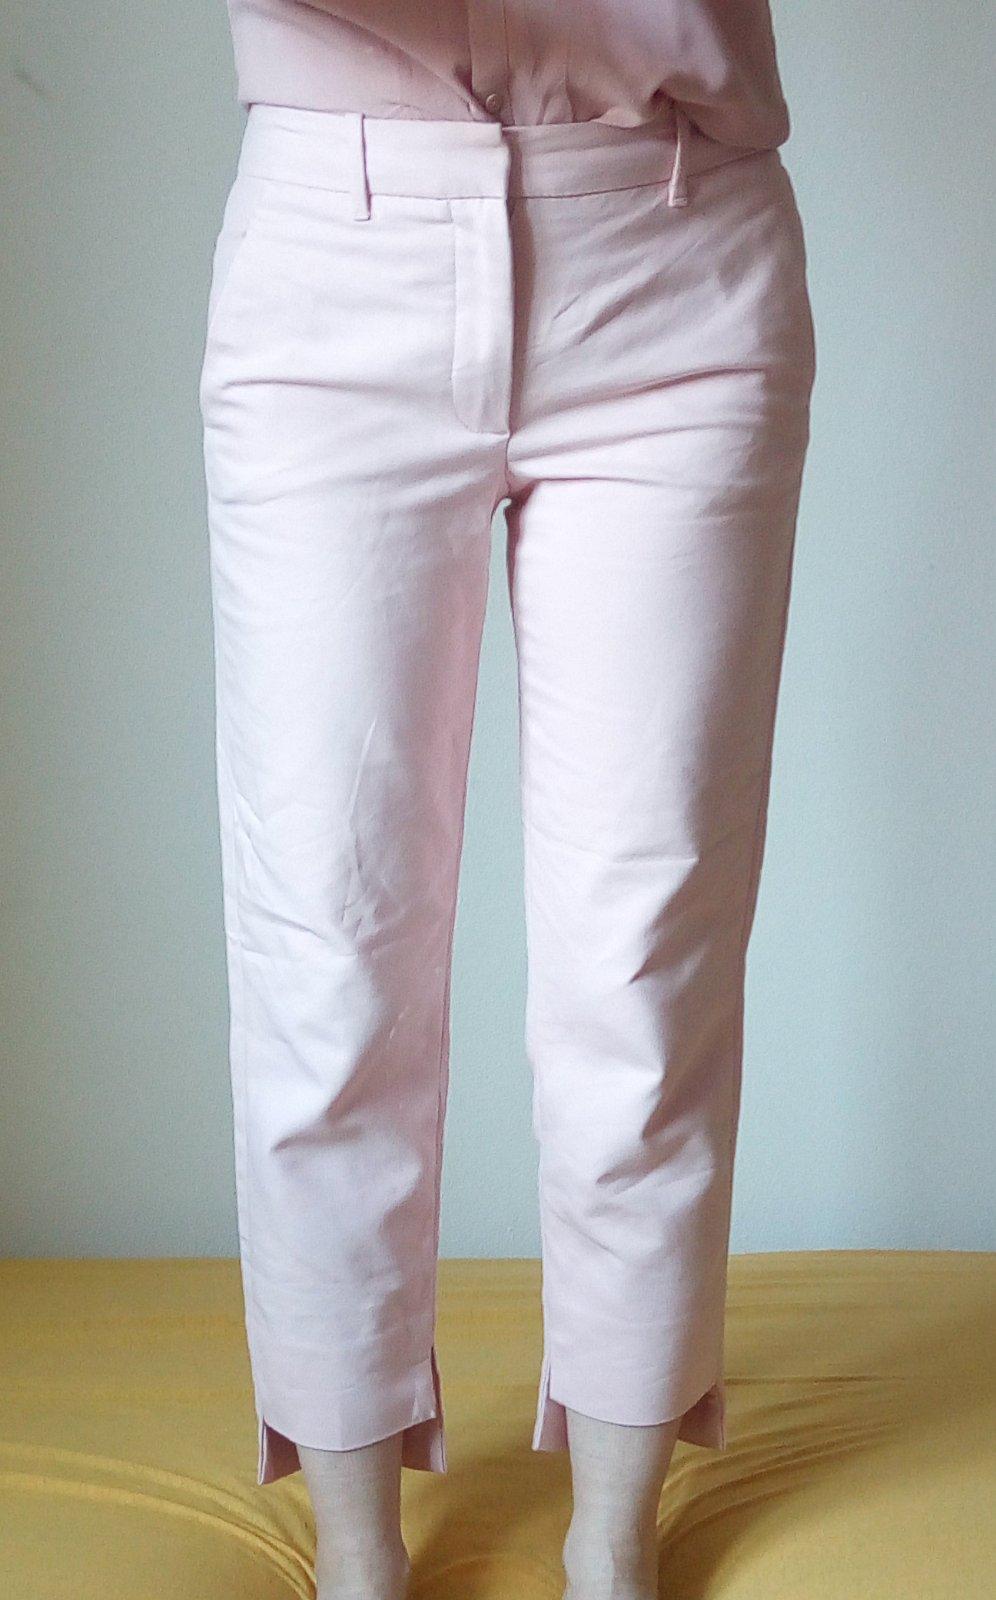 Bledoružové nohavice Zara S - Obrázok č. 1